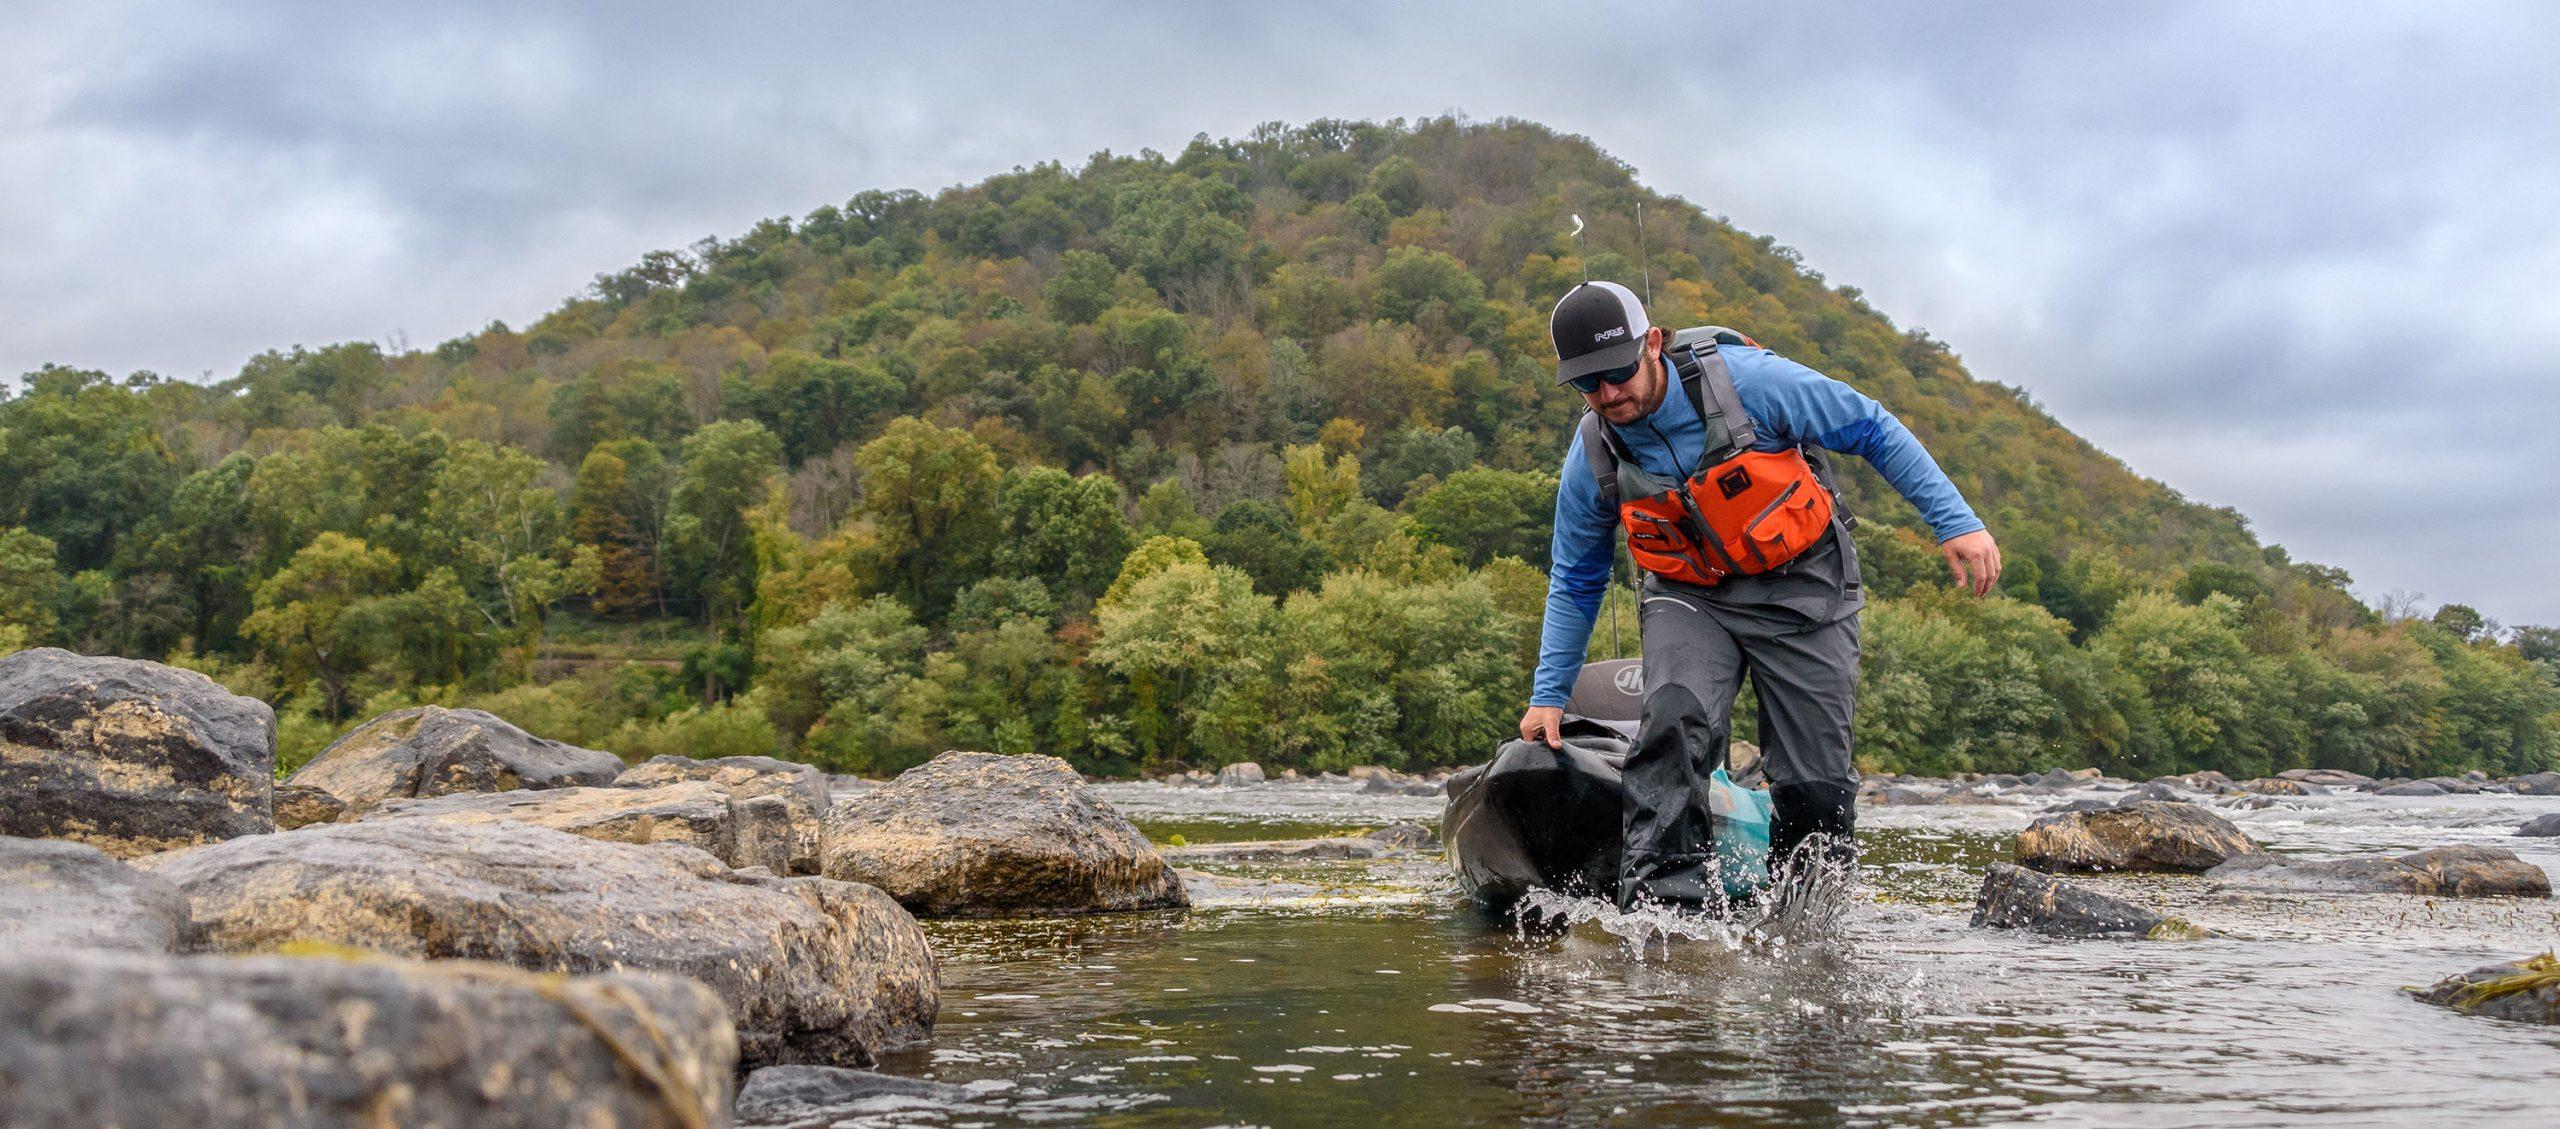 Man wearing PFD and dry pants and dragging his kayak through shallow water